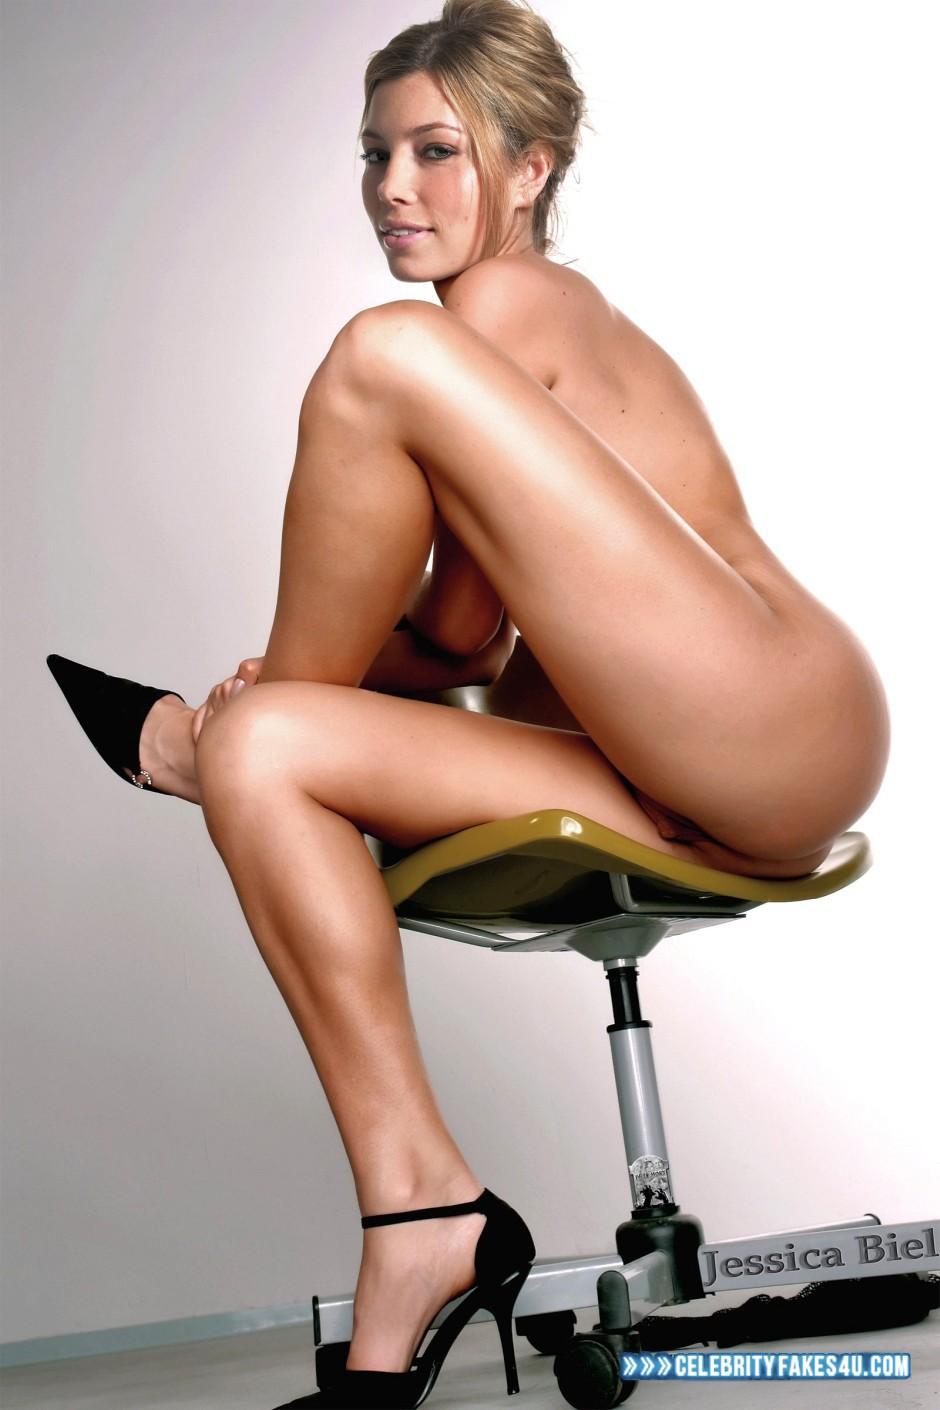 Jessica biel nude sexy horny — img 15